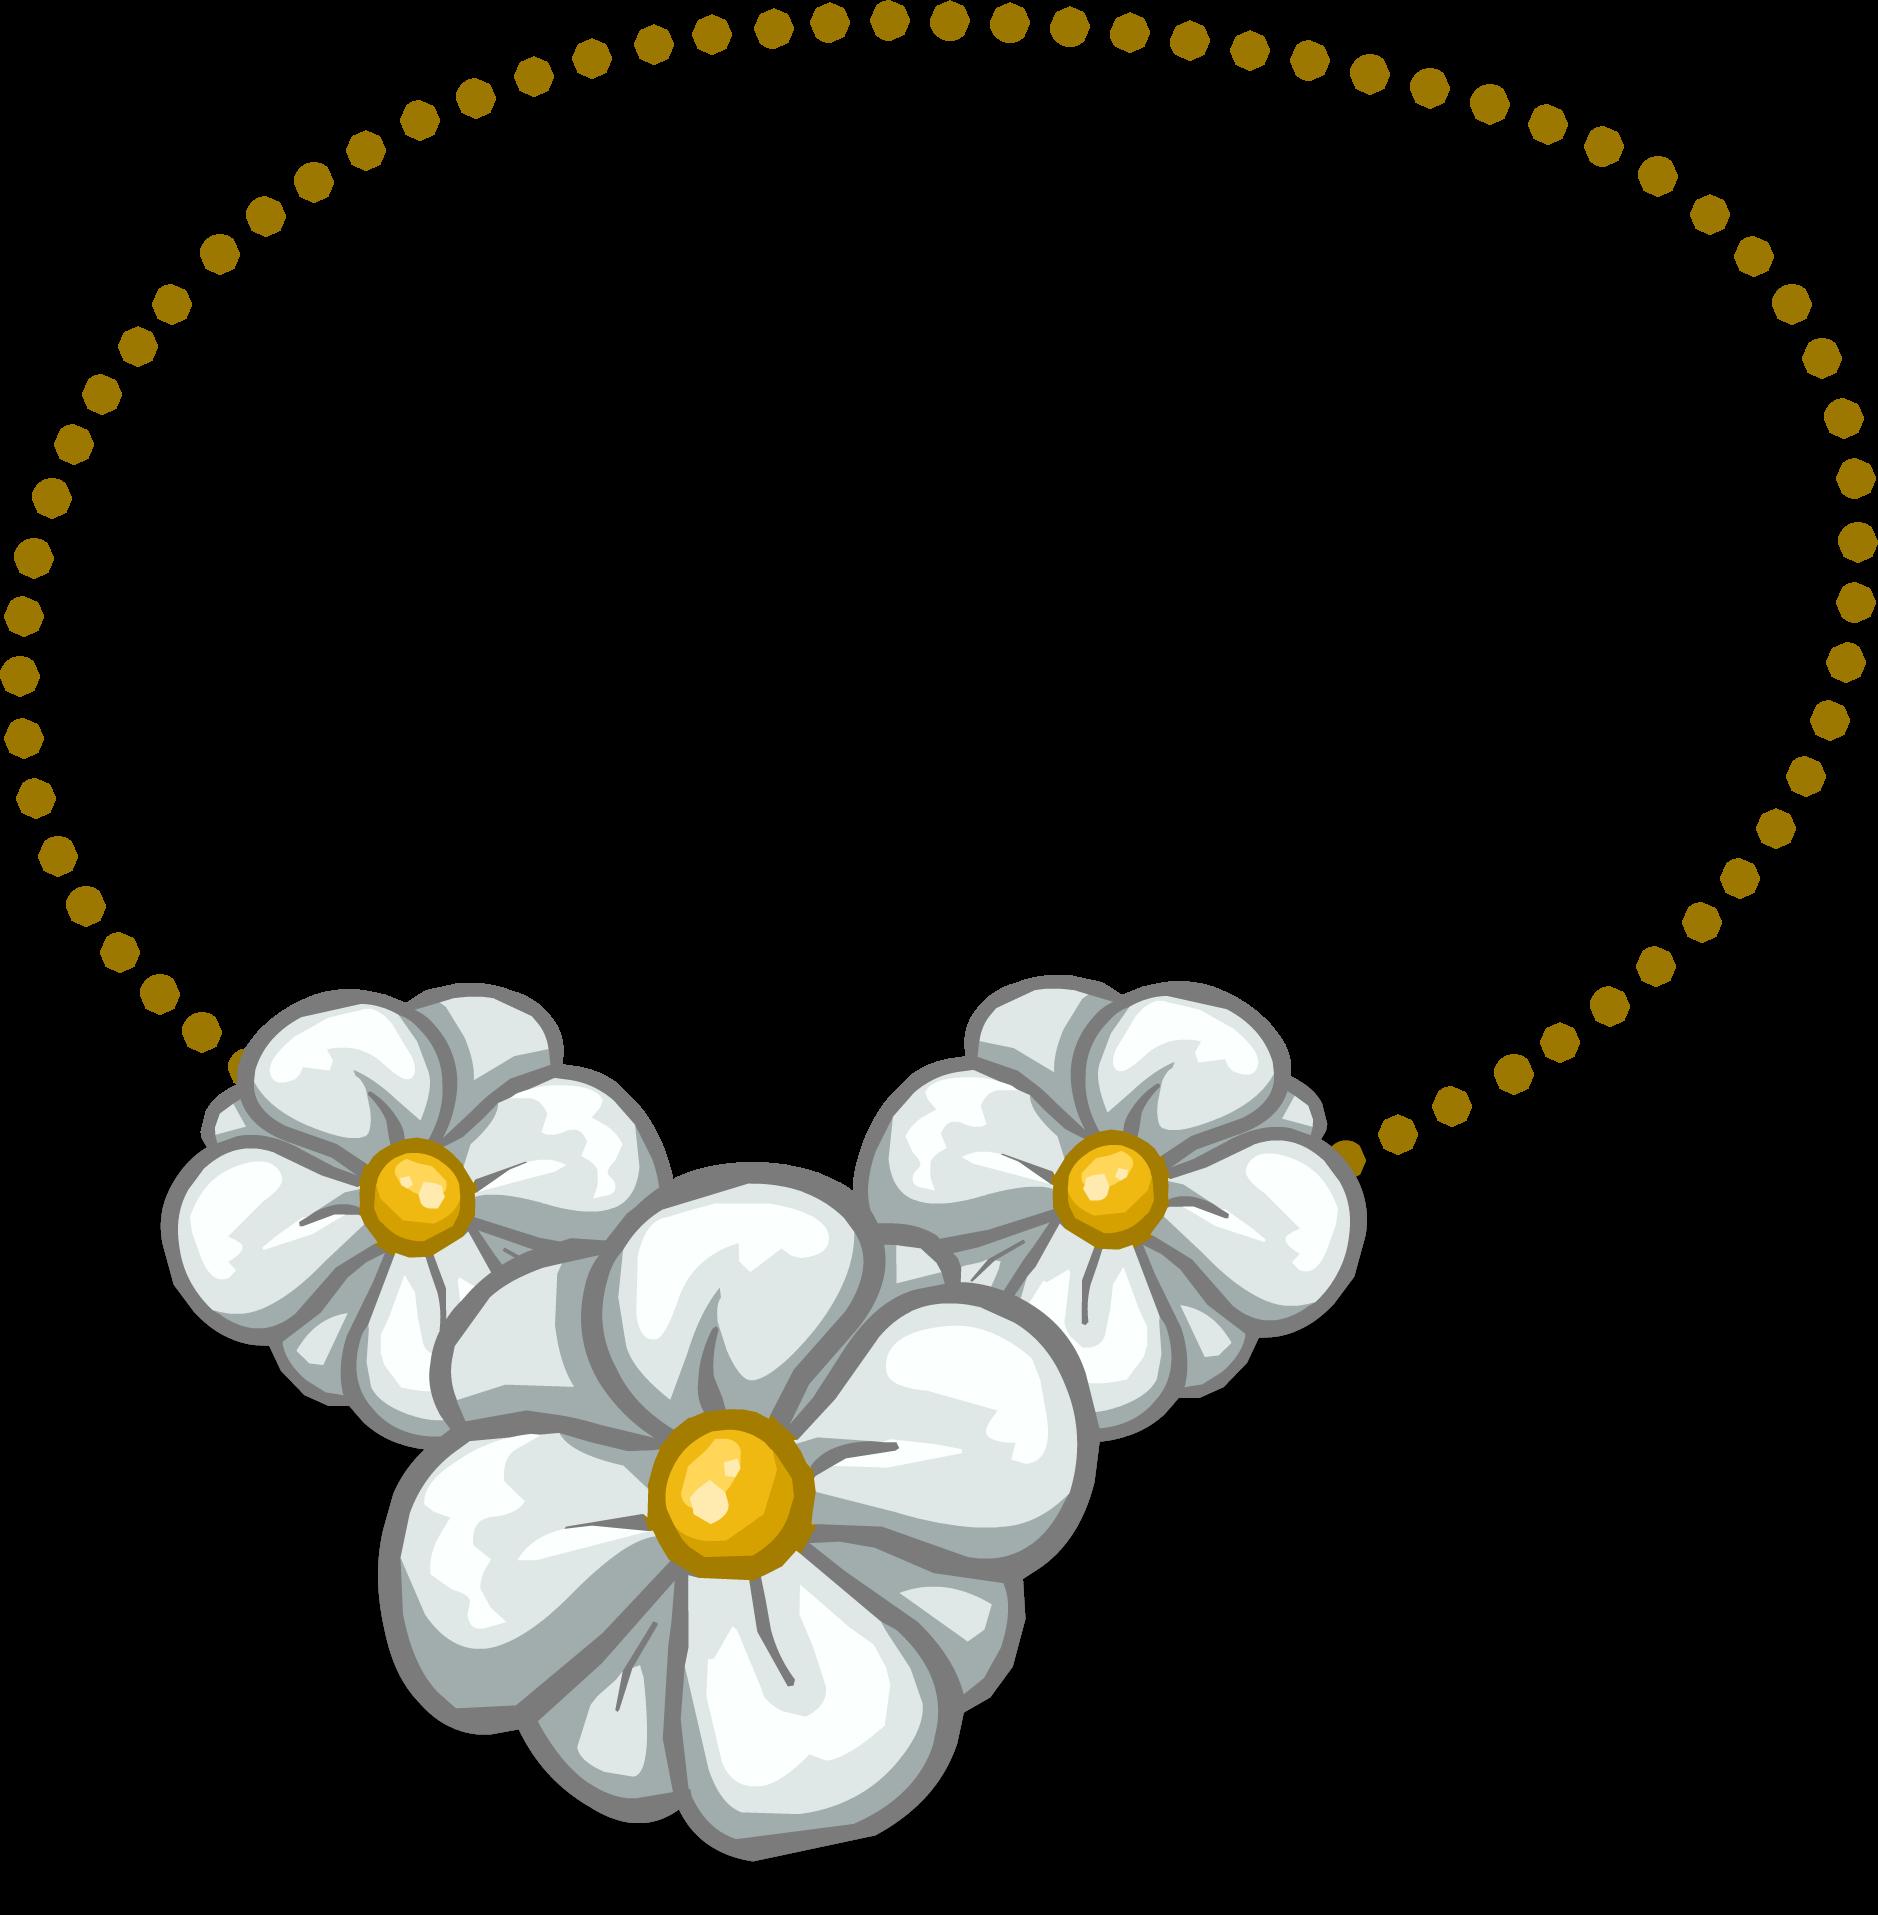 Daisy clipart daisy chain. Image clothing icon id